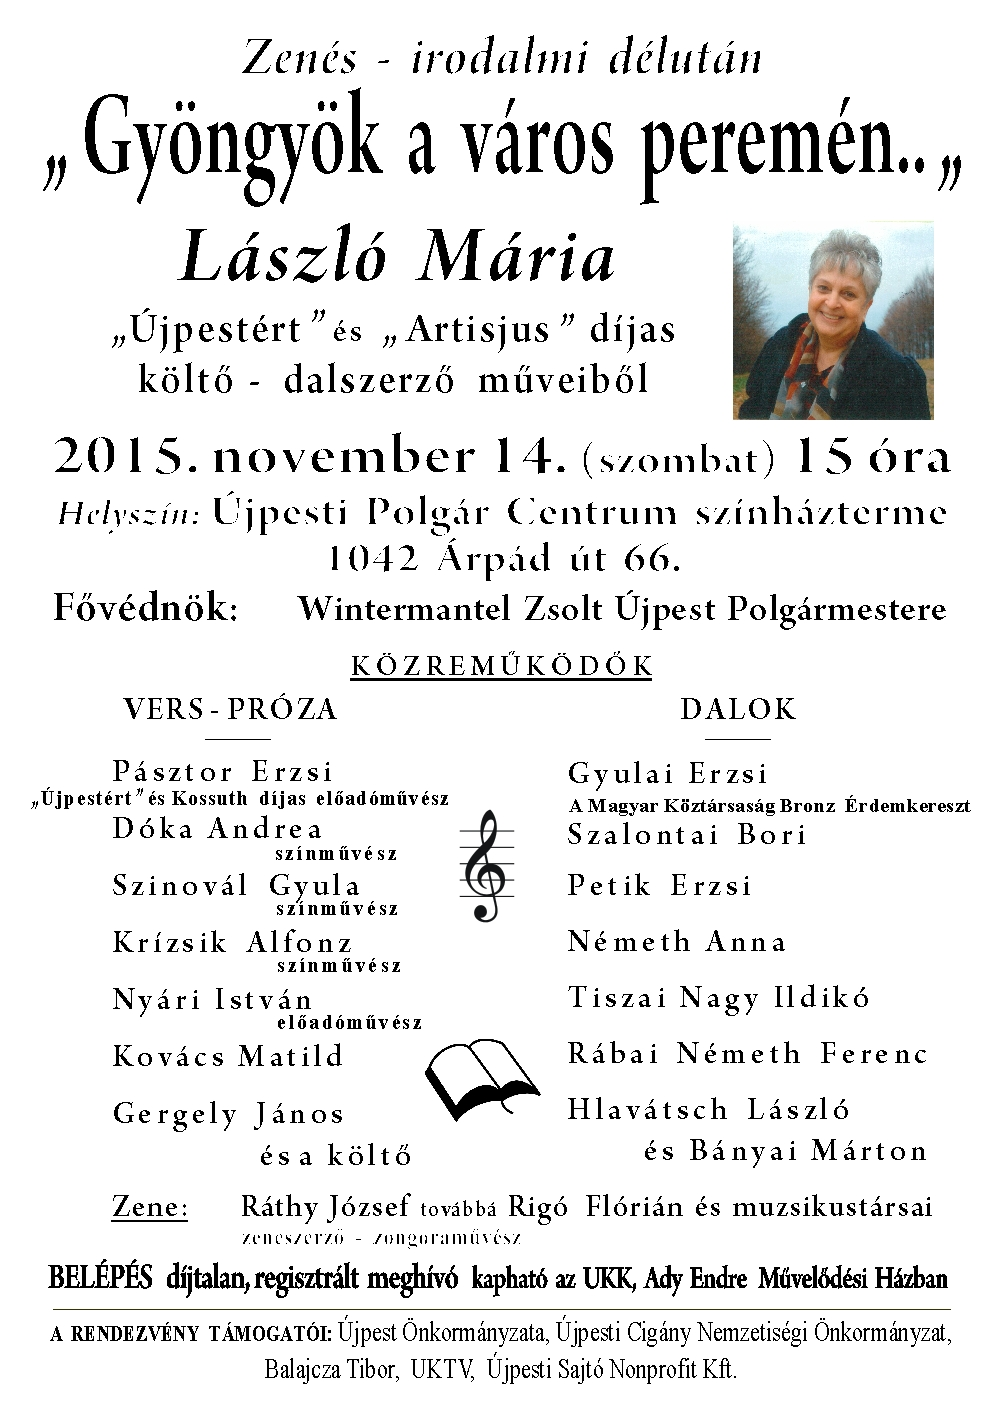 http://pctrs.network.hu/clubpicture/1/9/5/3/_/2015nov14_zenes_irodalmi_szerzoi_rendezveny_ujpesten_1953327_5147.jpg